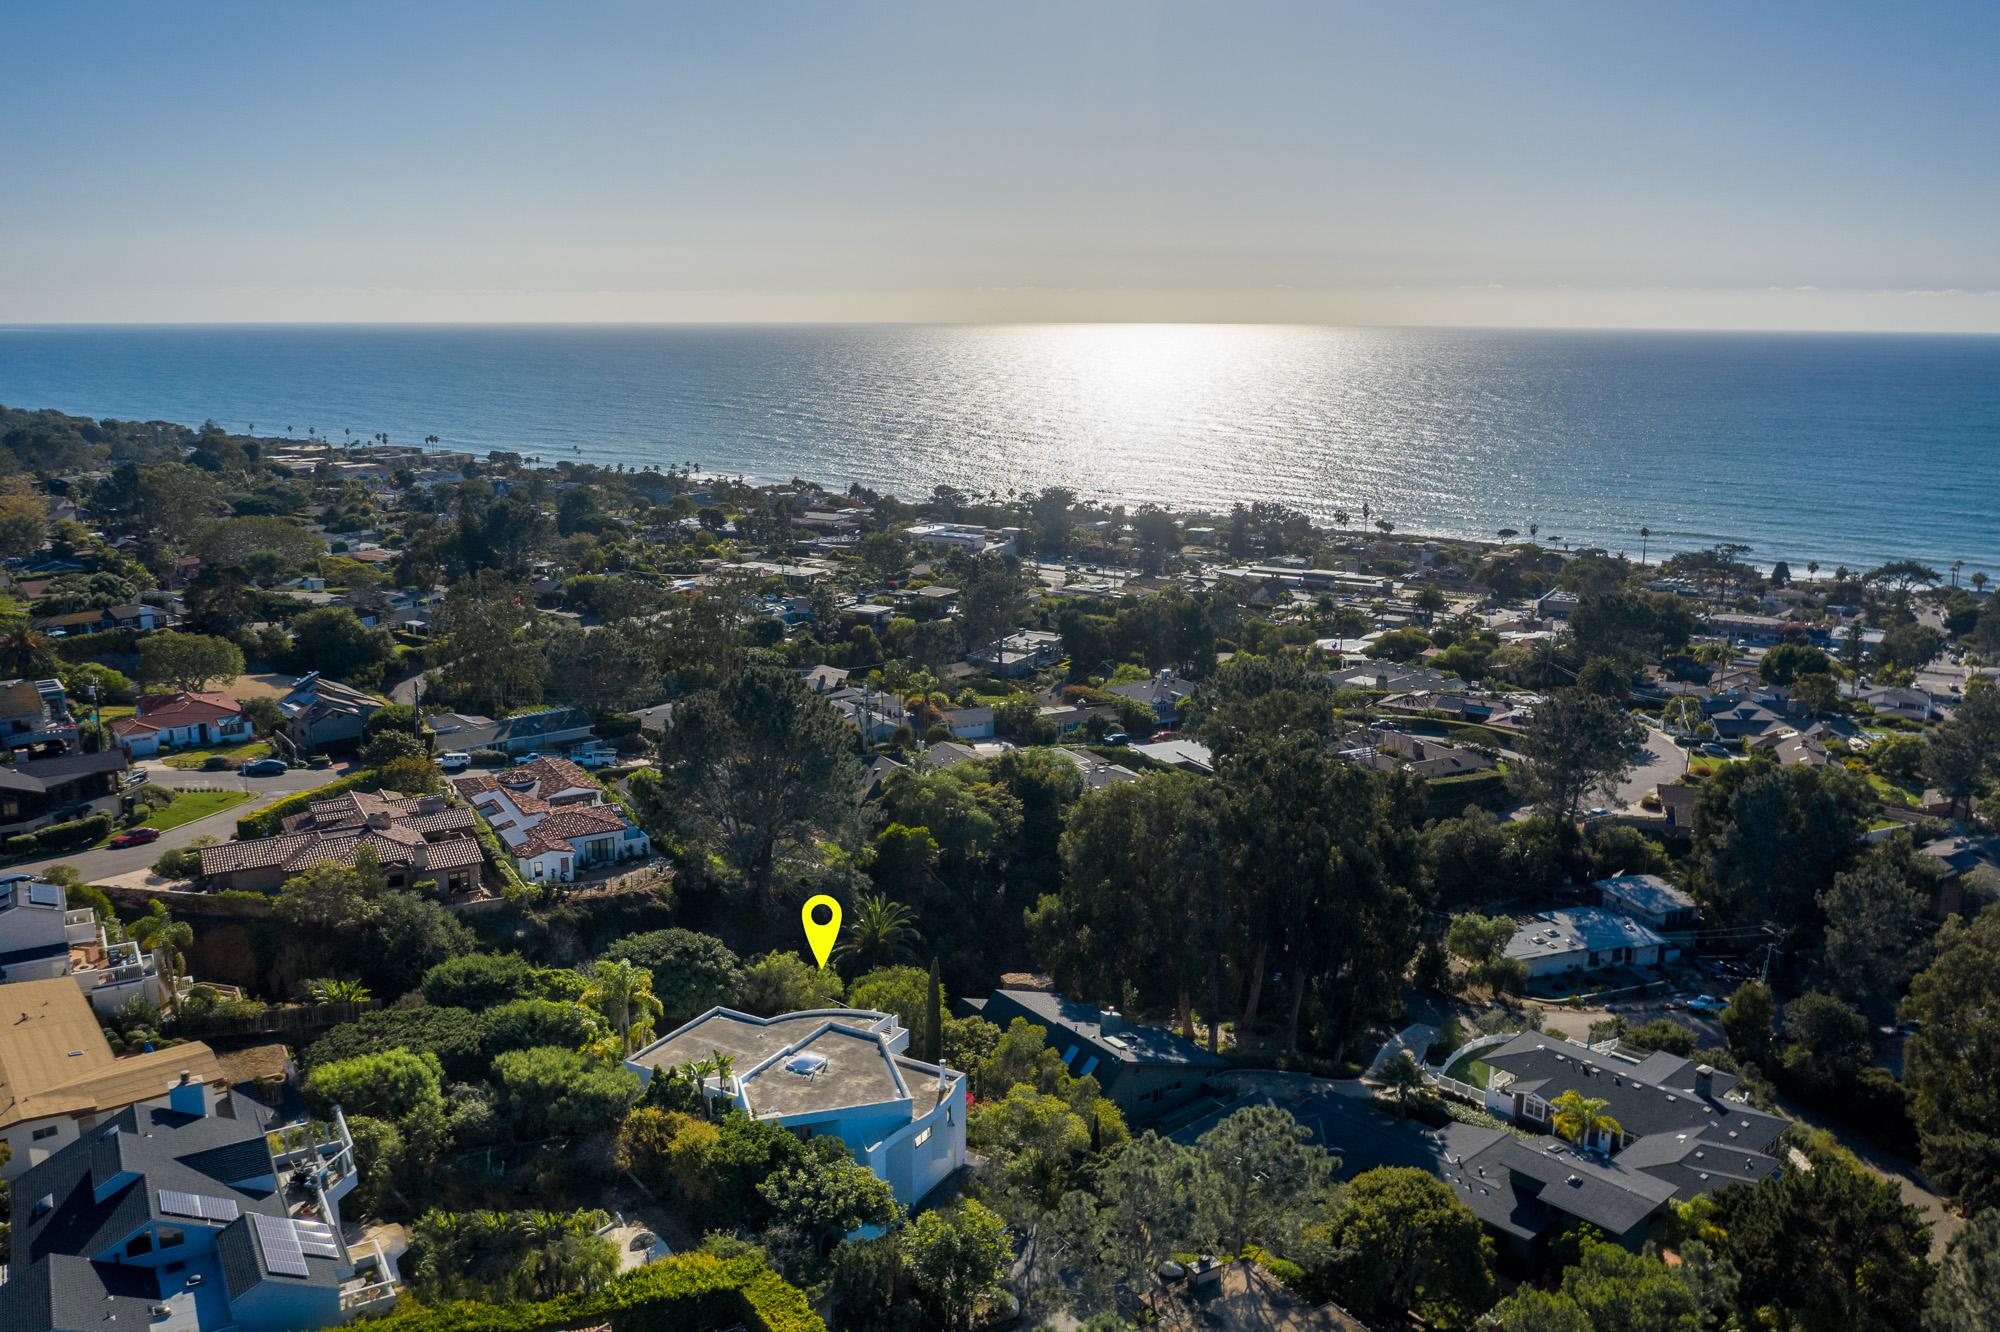 Sold 2021 Represented Buyer & Seller -  Del Mar, CA 92014